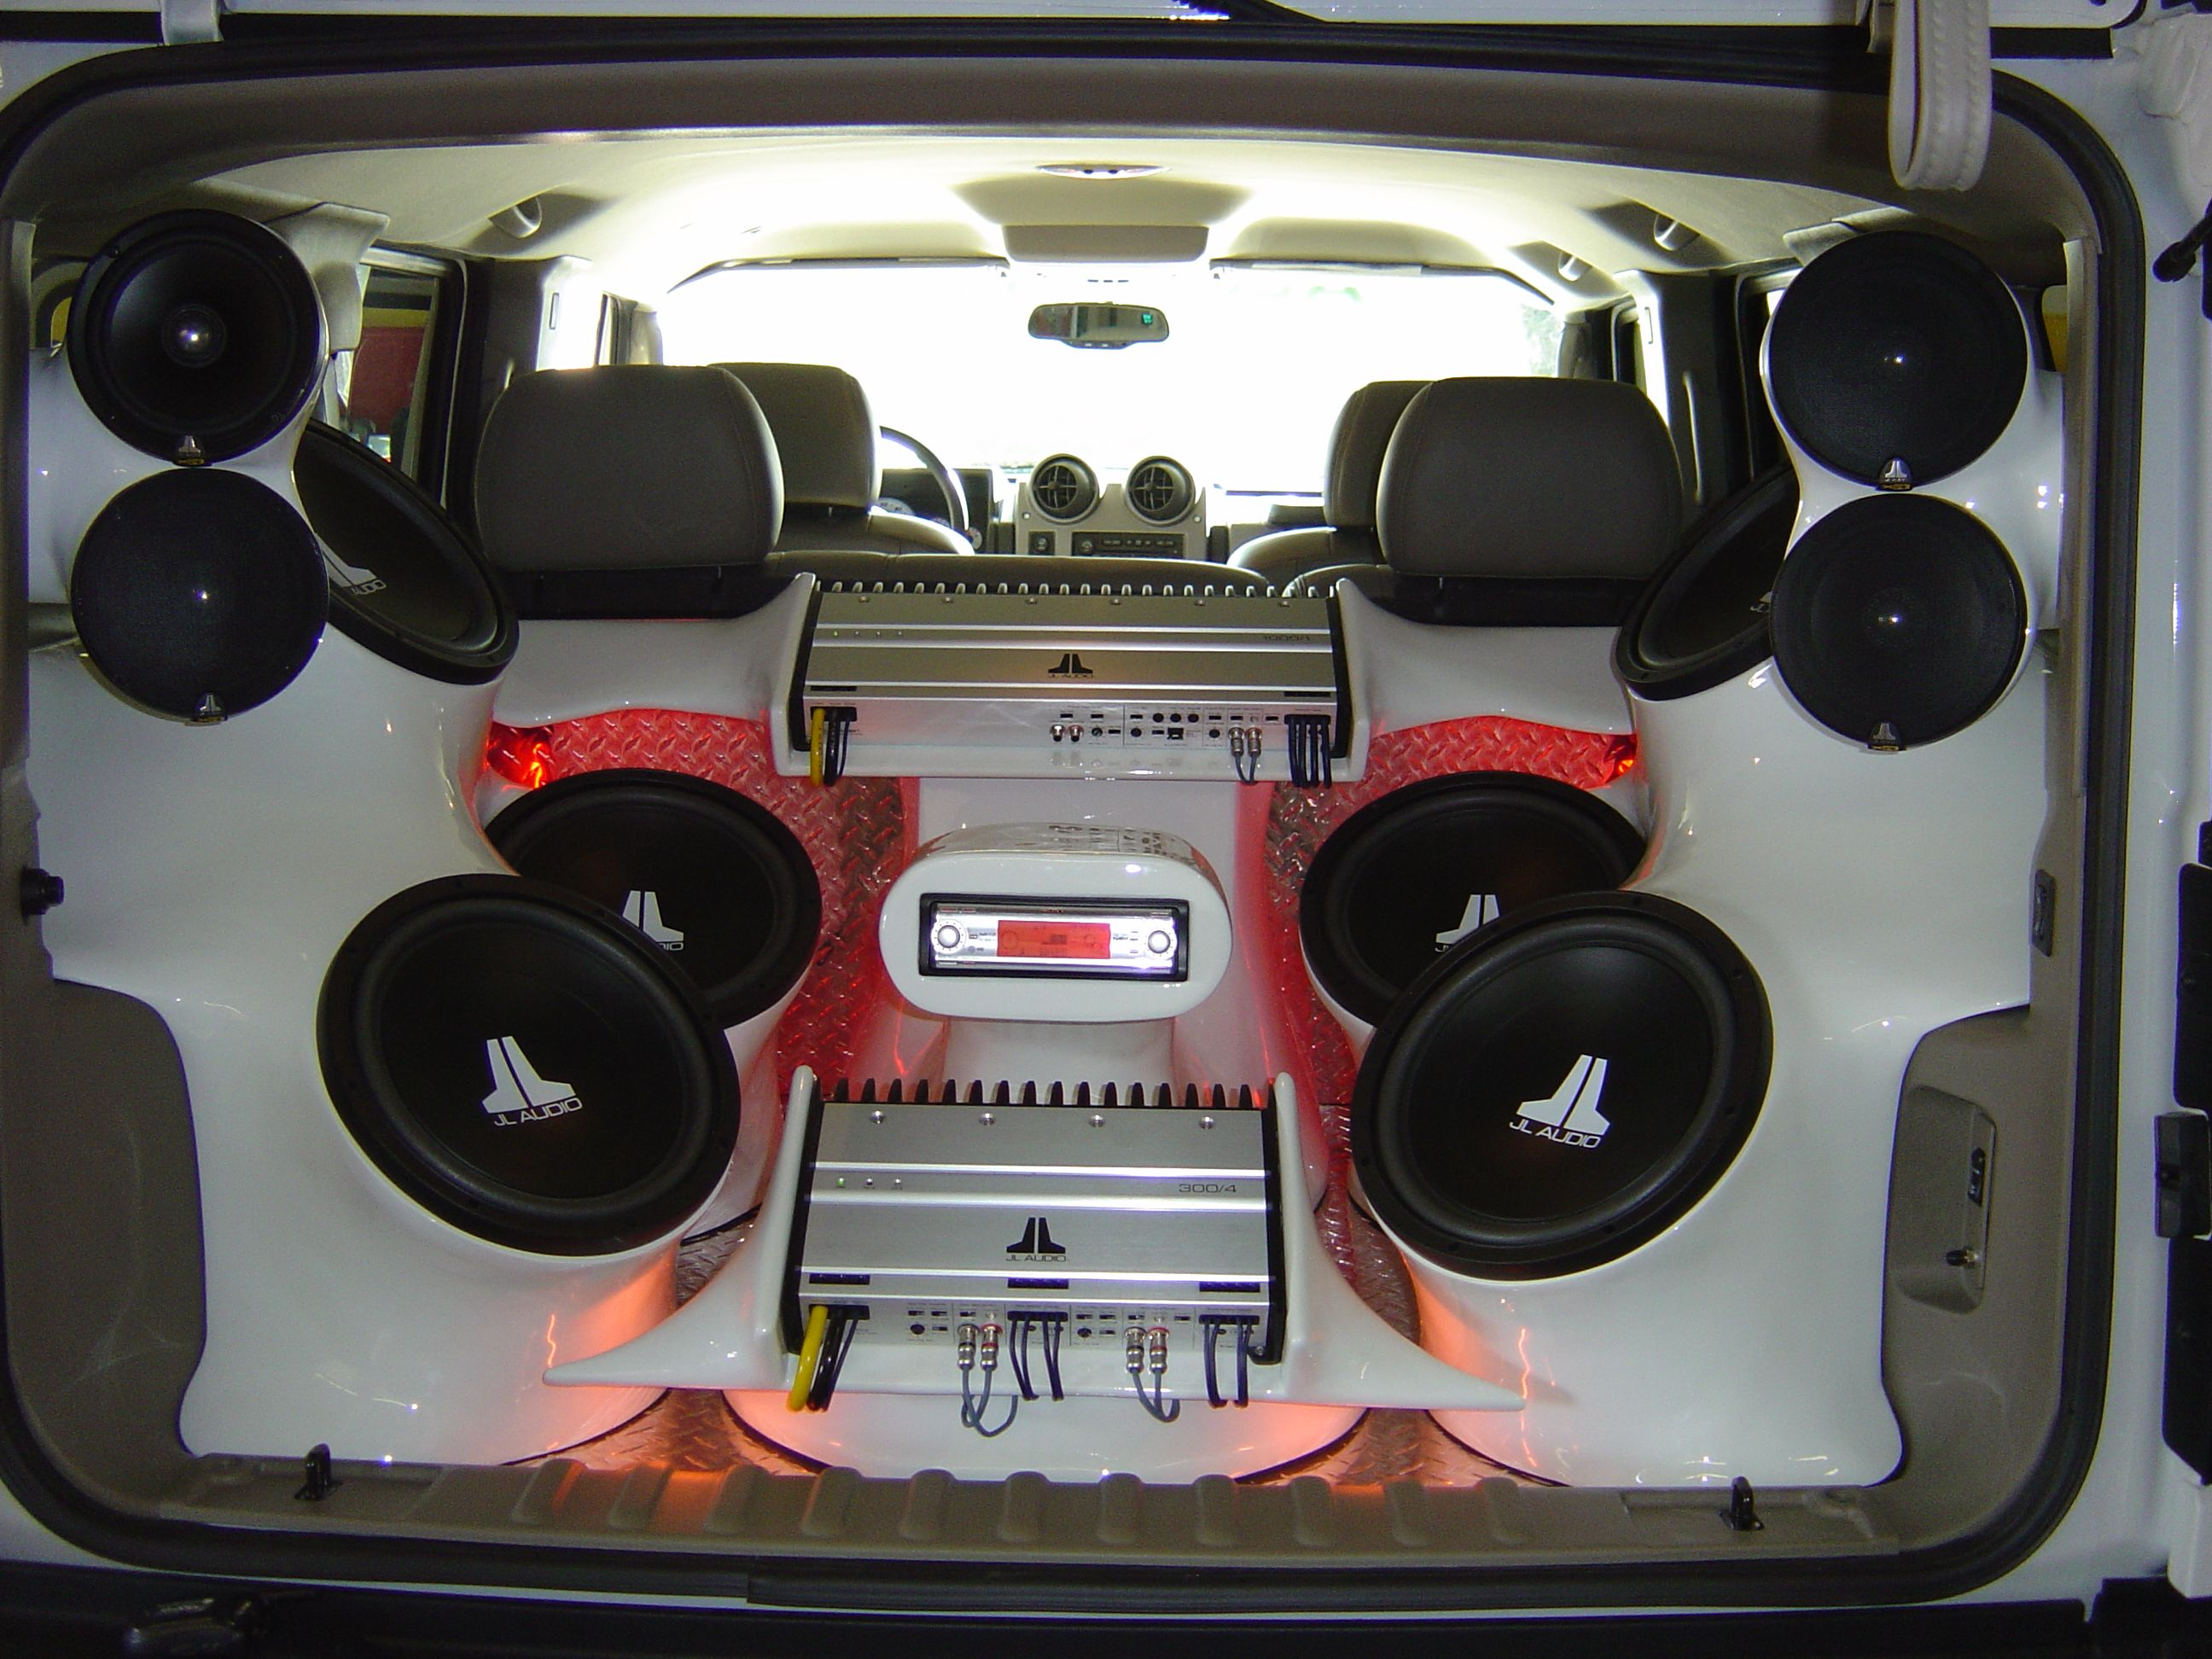 Jl audio sub s amps speakers in custom enclosure amp rack w rear stereo